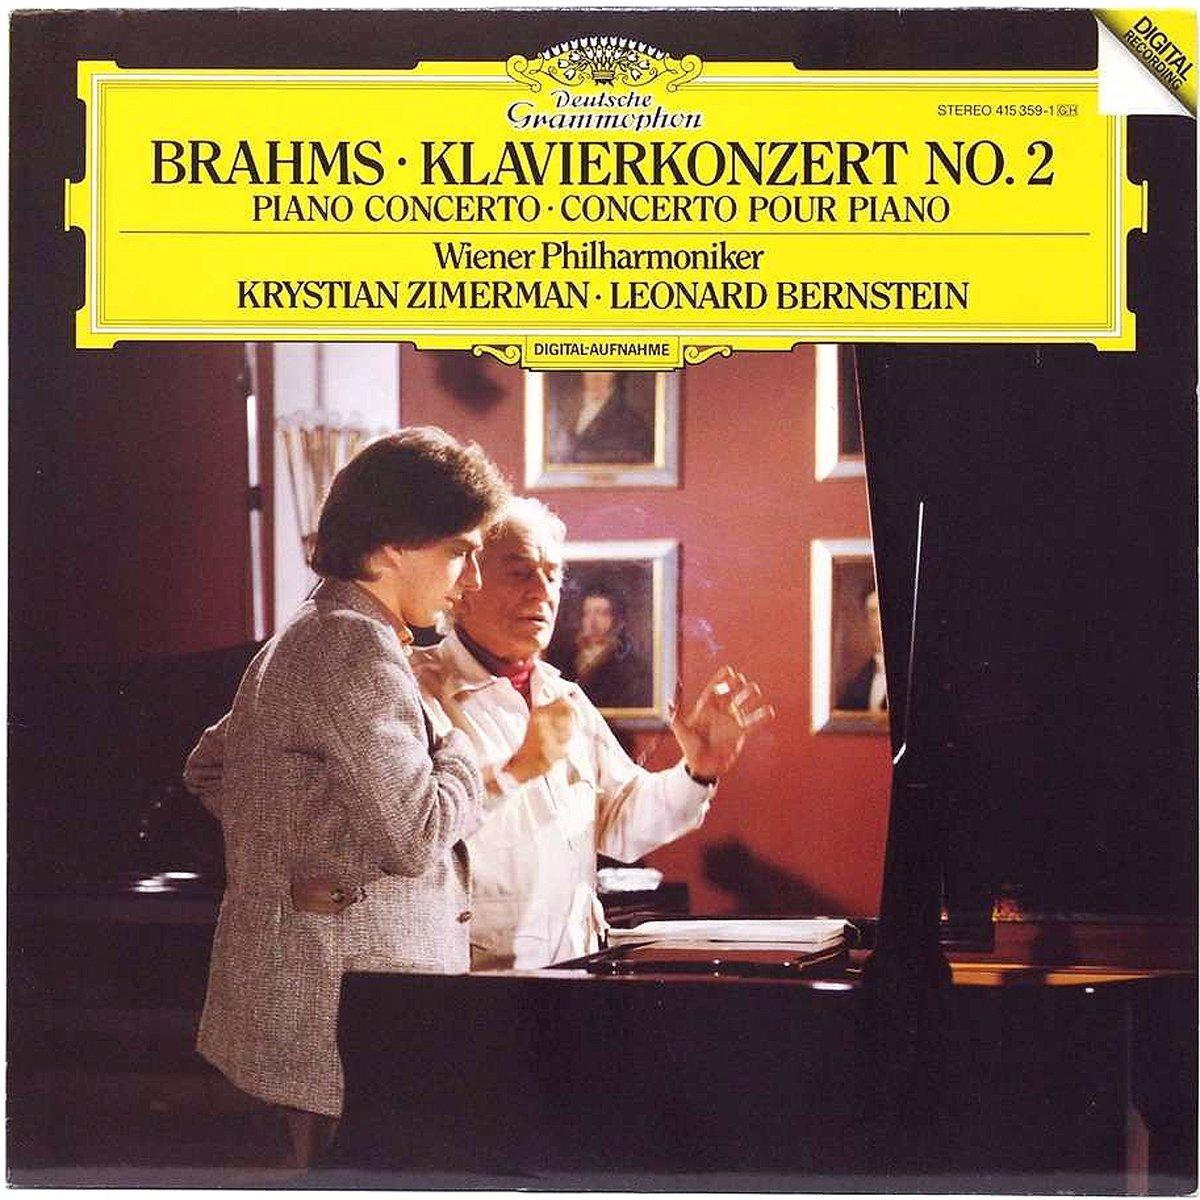 DGG 415 359 Brahms Concerto Piano Zimerman Bernstein DGG Digital Aufnahme